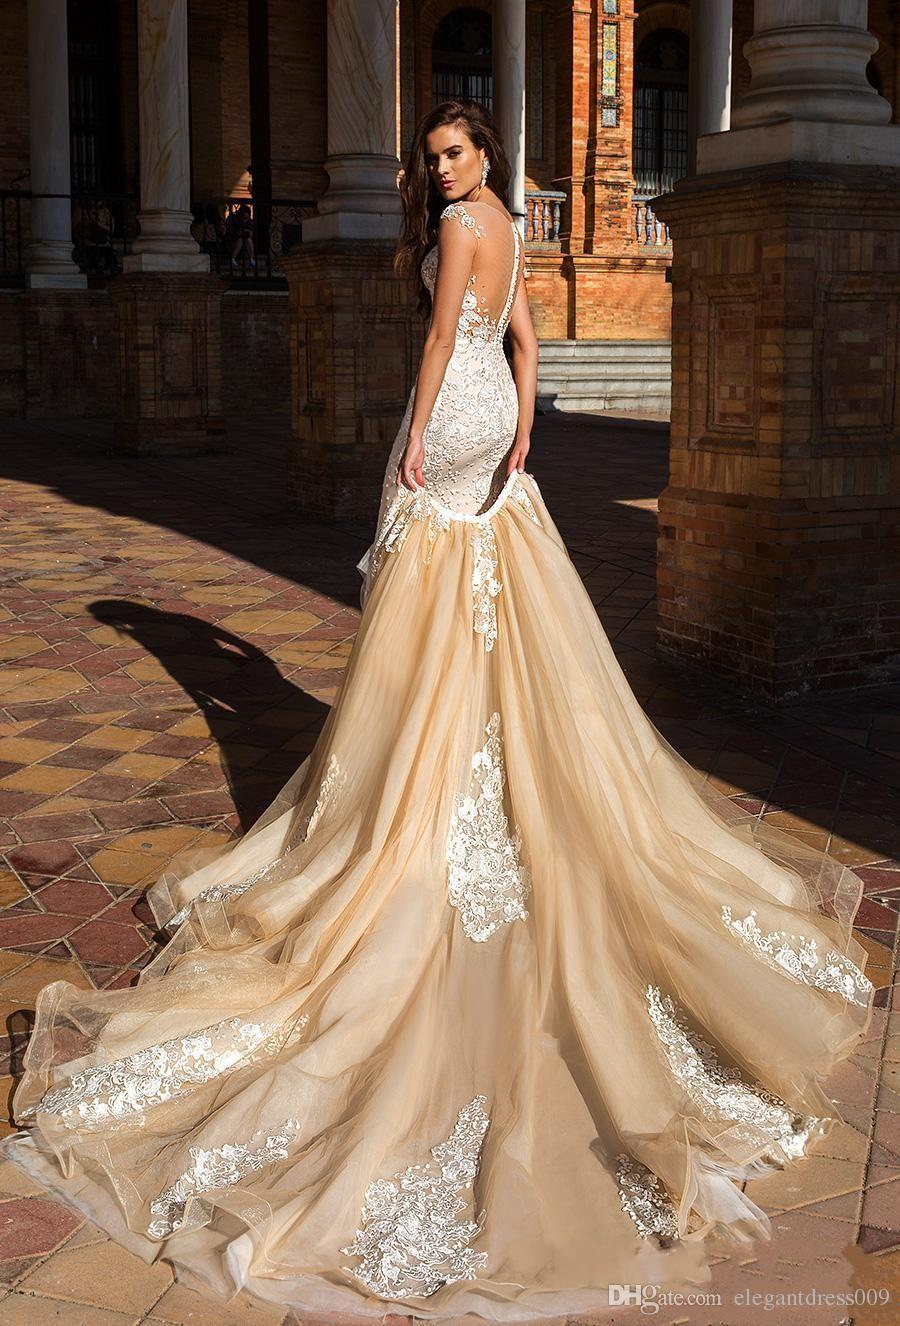 Großhandel Milla Nova 2018 Champagner Meerjungfrau Hochzeitskleid ...